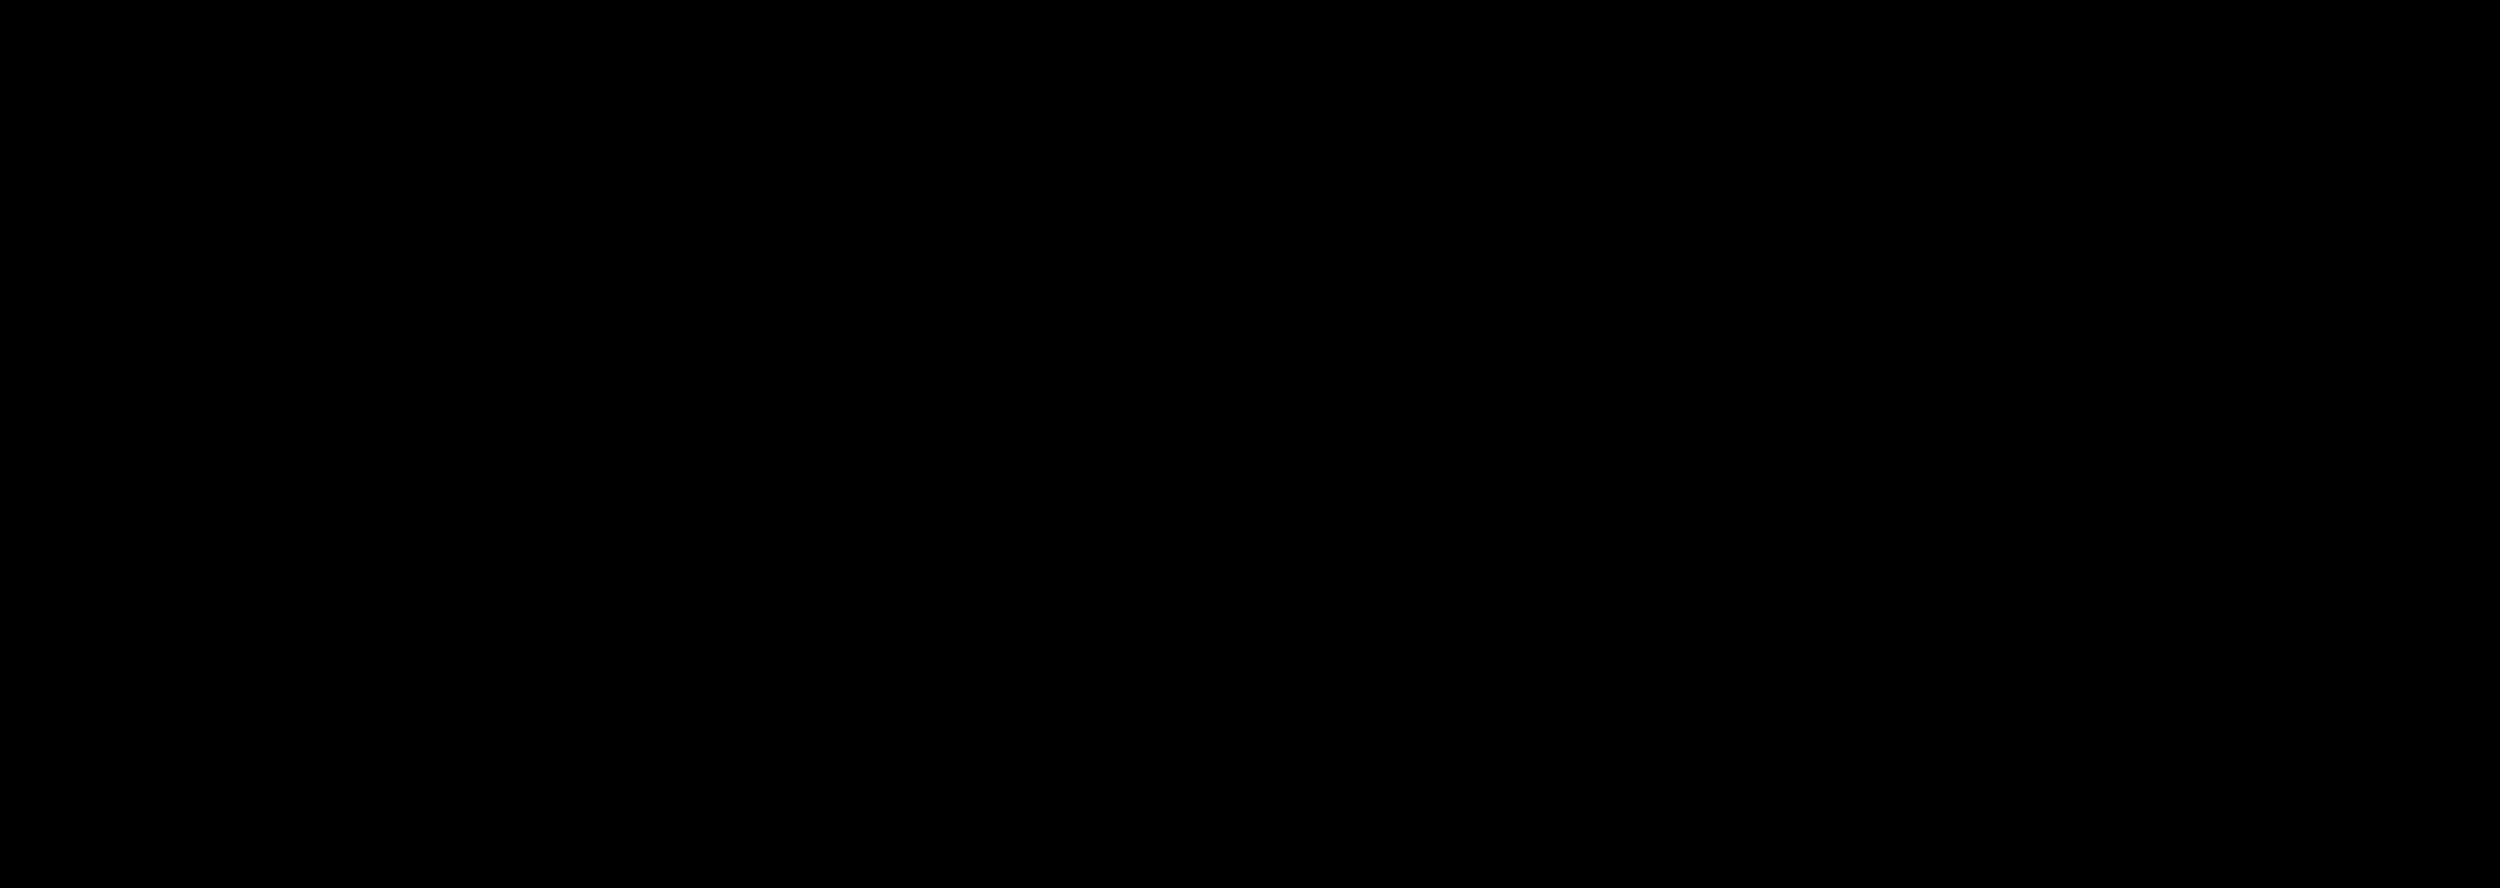 Altantic Exposure _Font-01.png